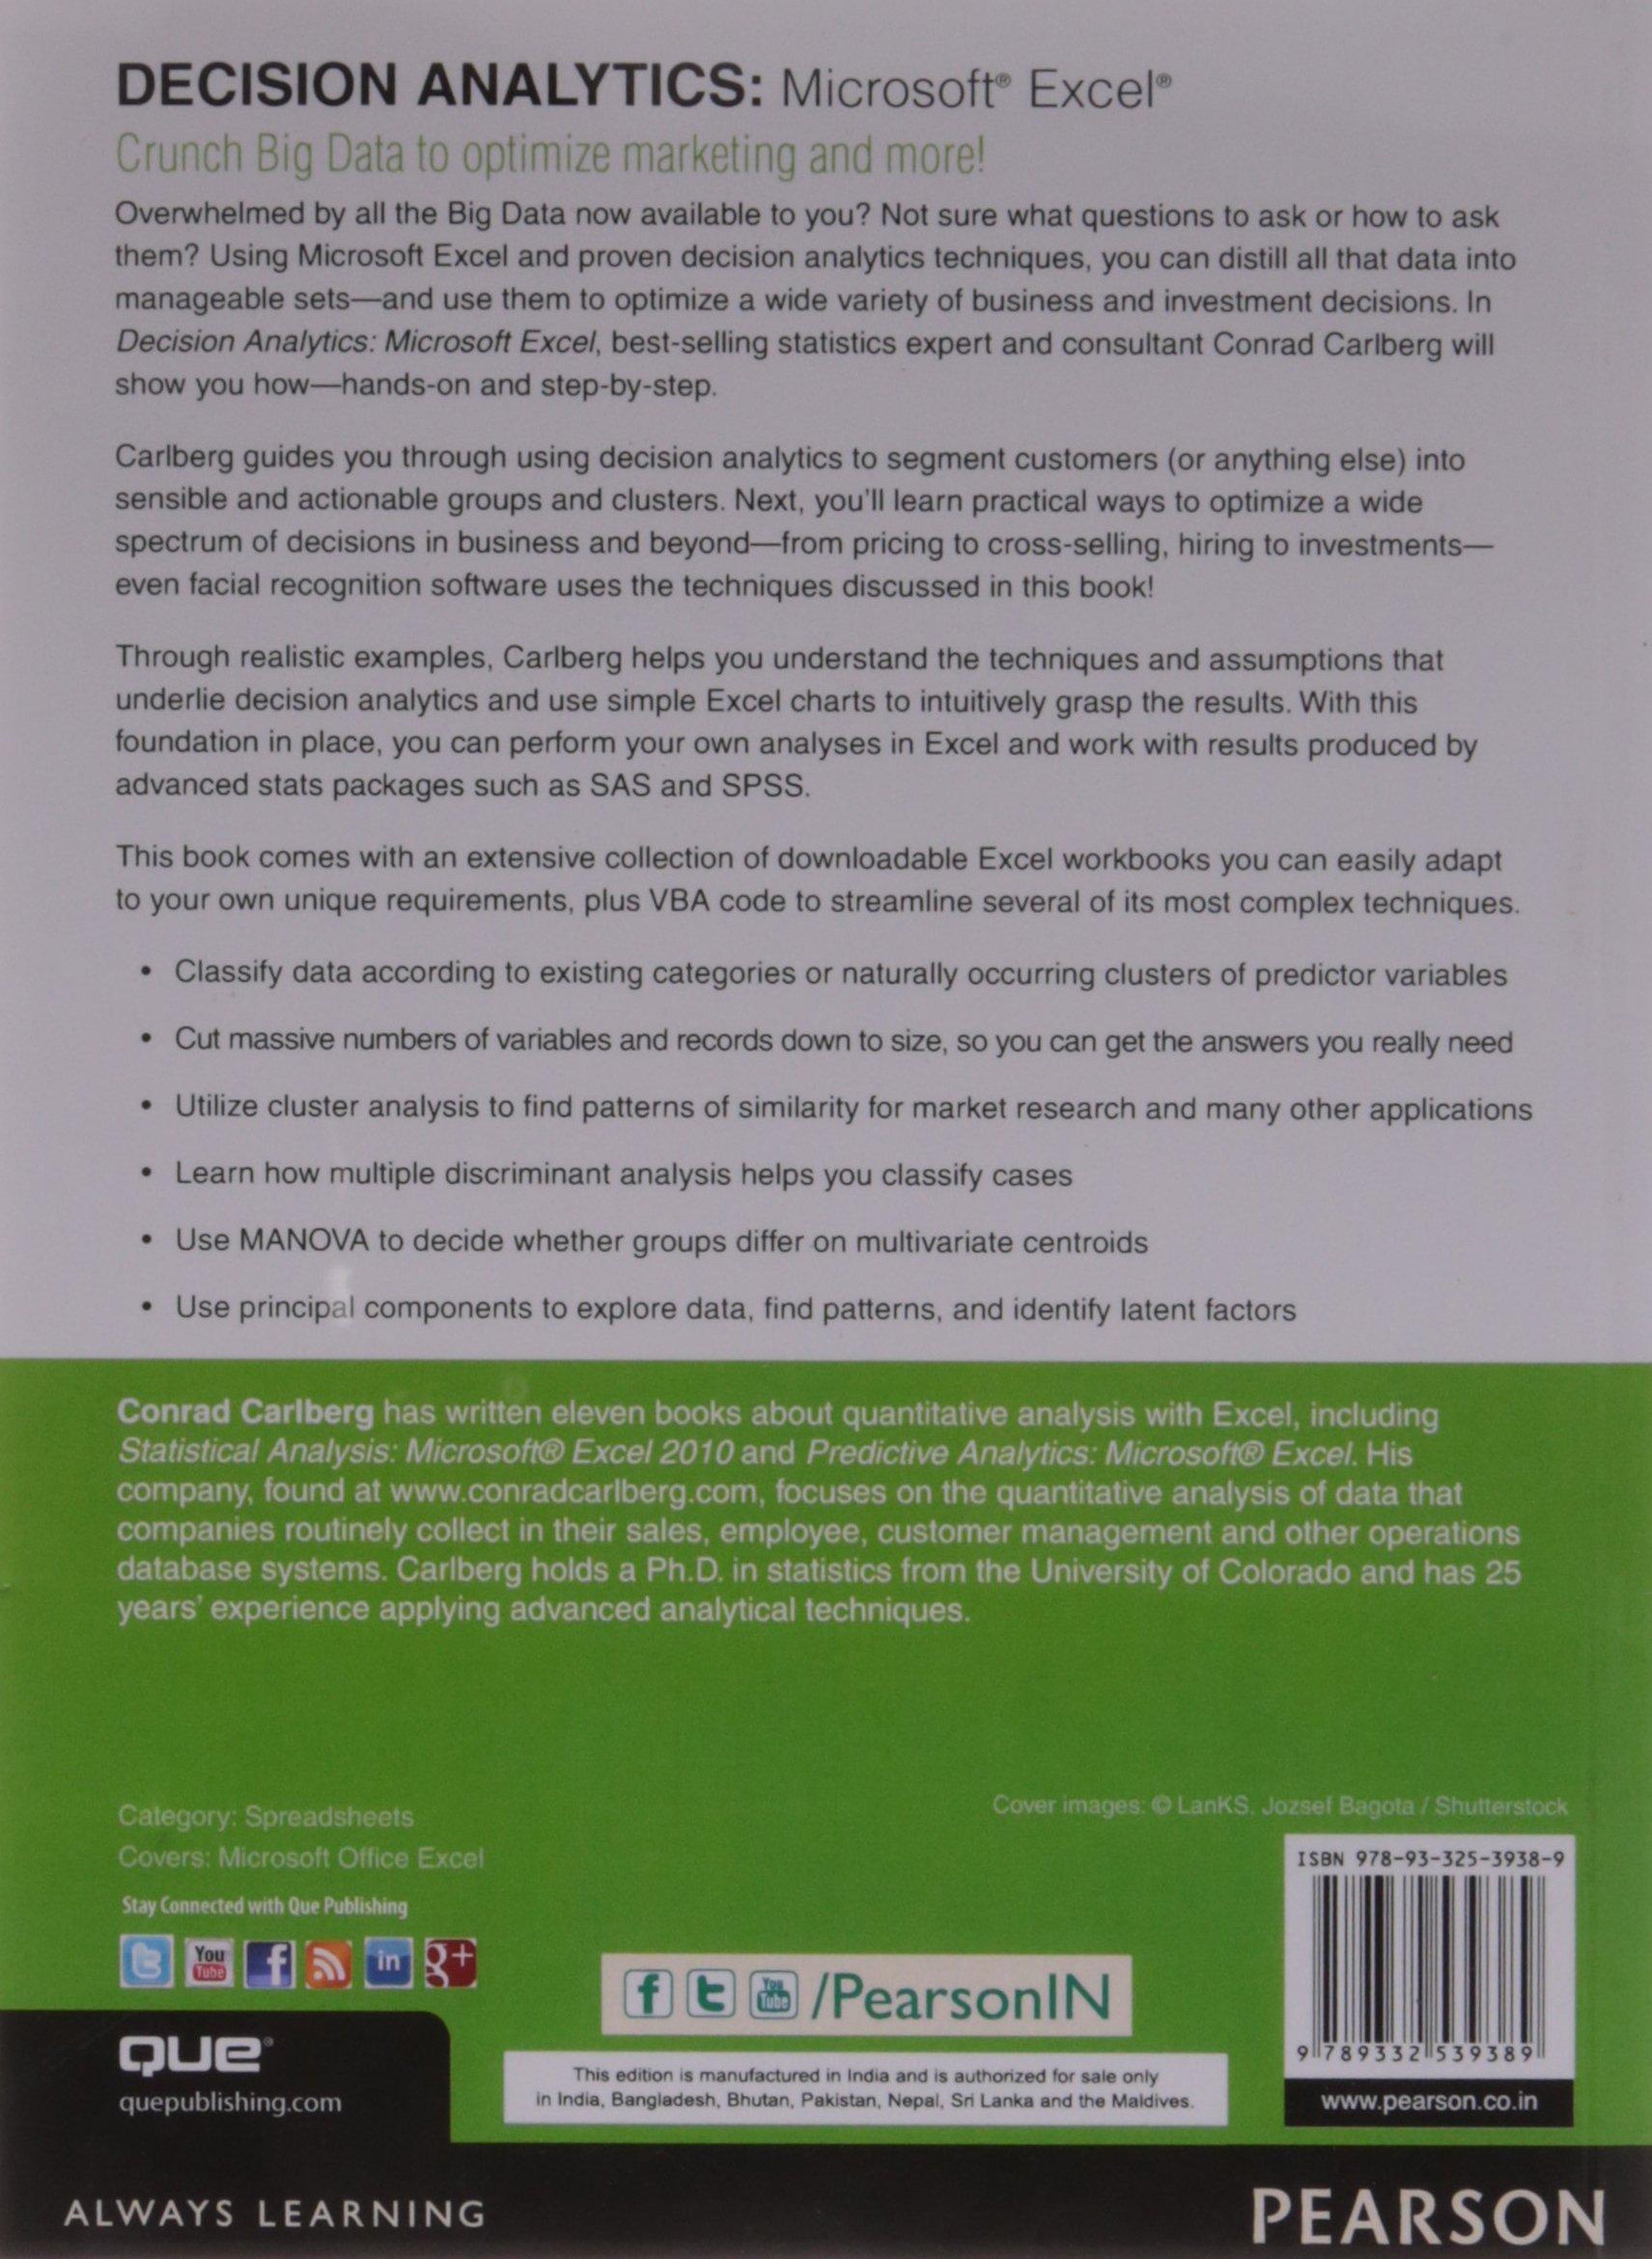 Decision Analytics: Microsoft Excel 1/e: Conrad Carlberg